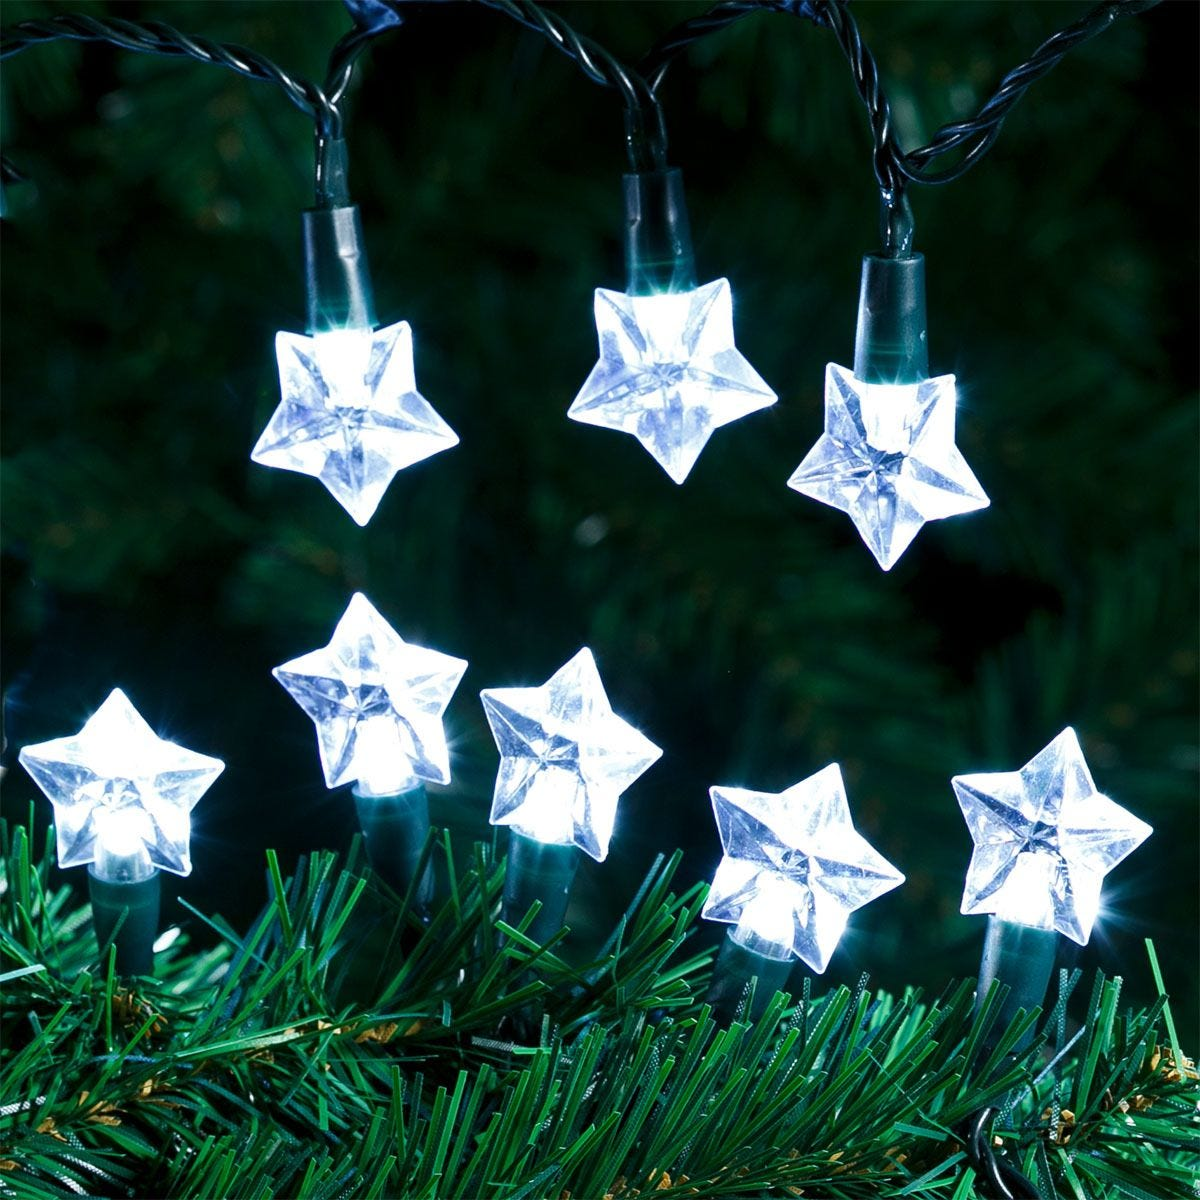 Robert Dyas 100 LED Star String Lights - Ice White